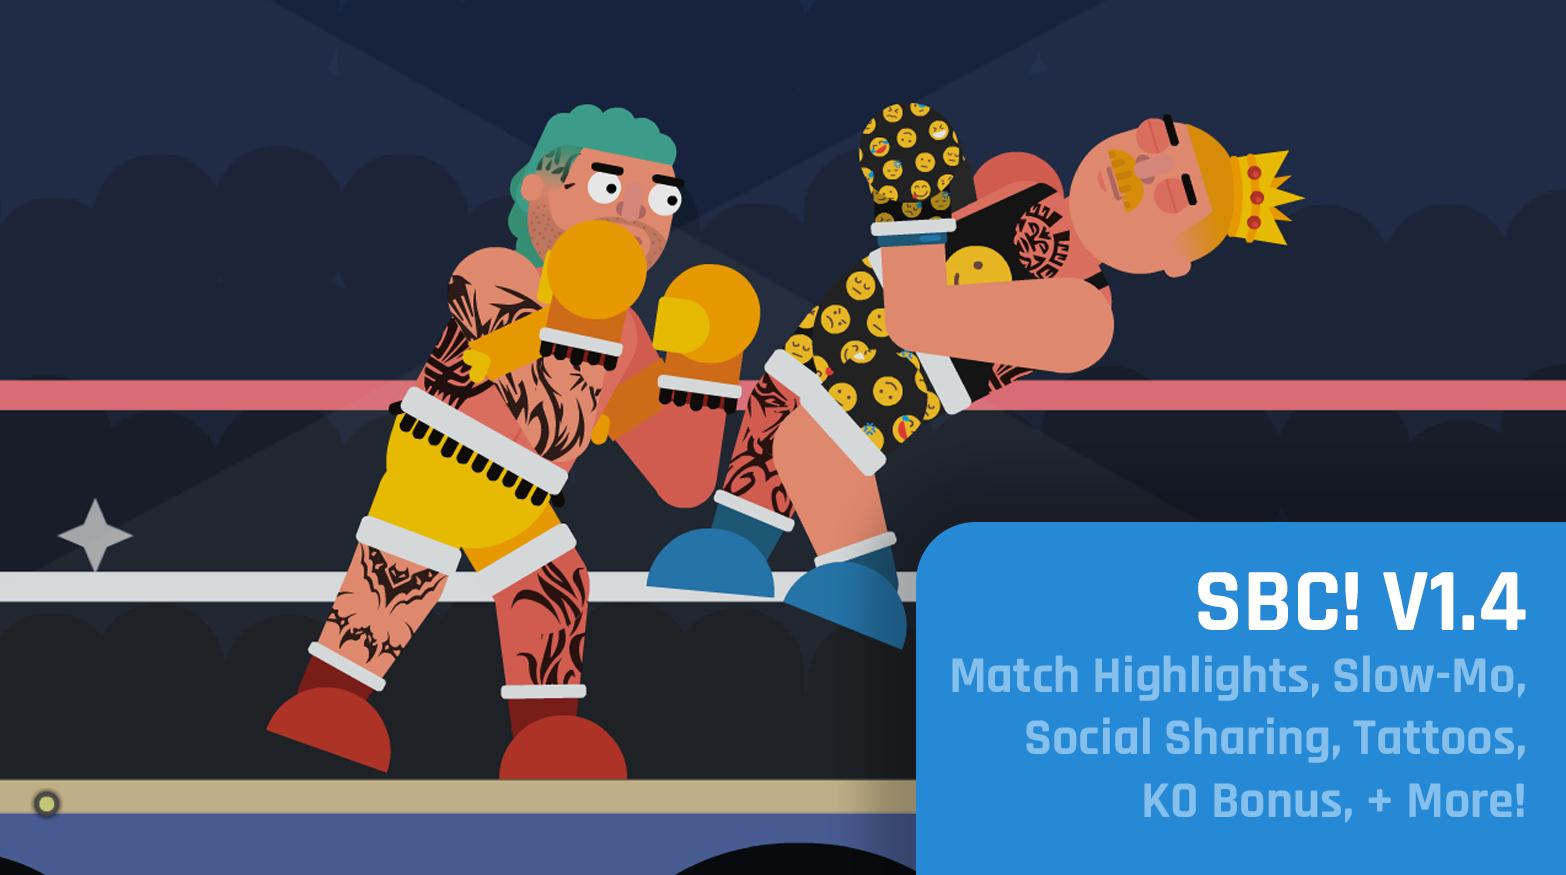 You are currently viewing Match Highlights, Slow-Mo, Social Sharing, Tattoos, KO Bonus, + More! – Super Boxing Championship! v1.4 Dev Notes